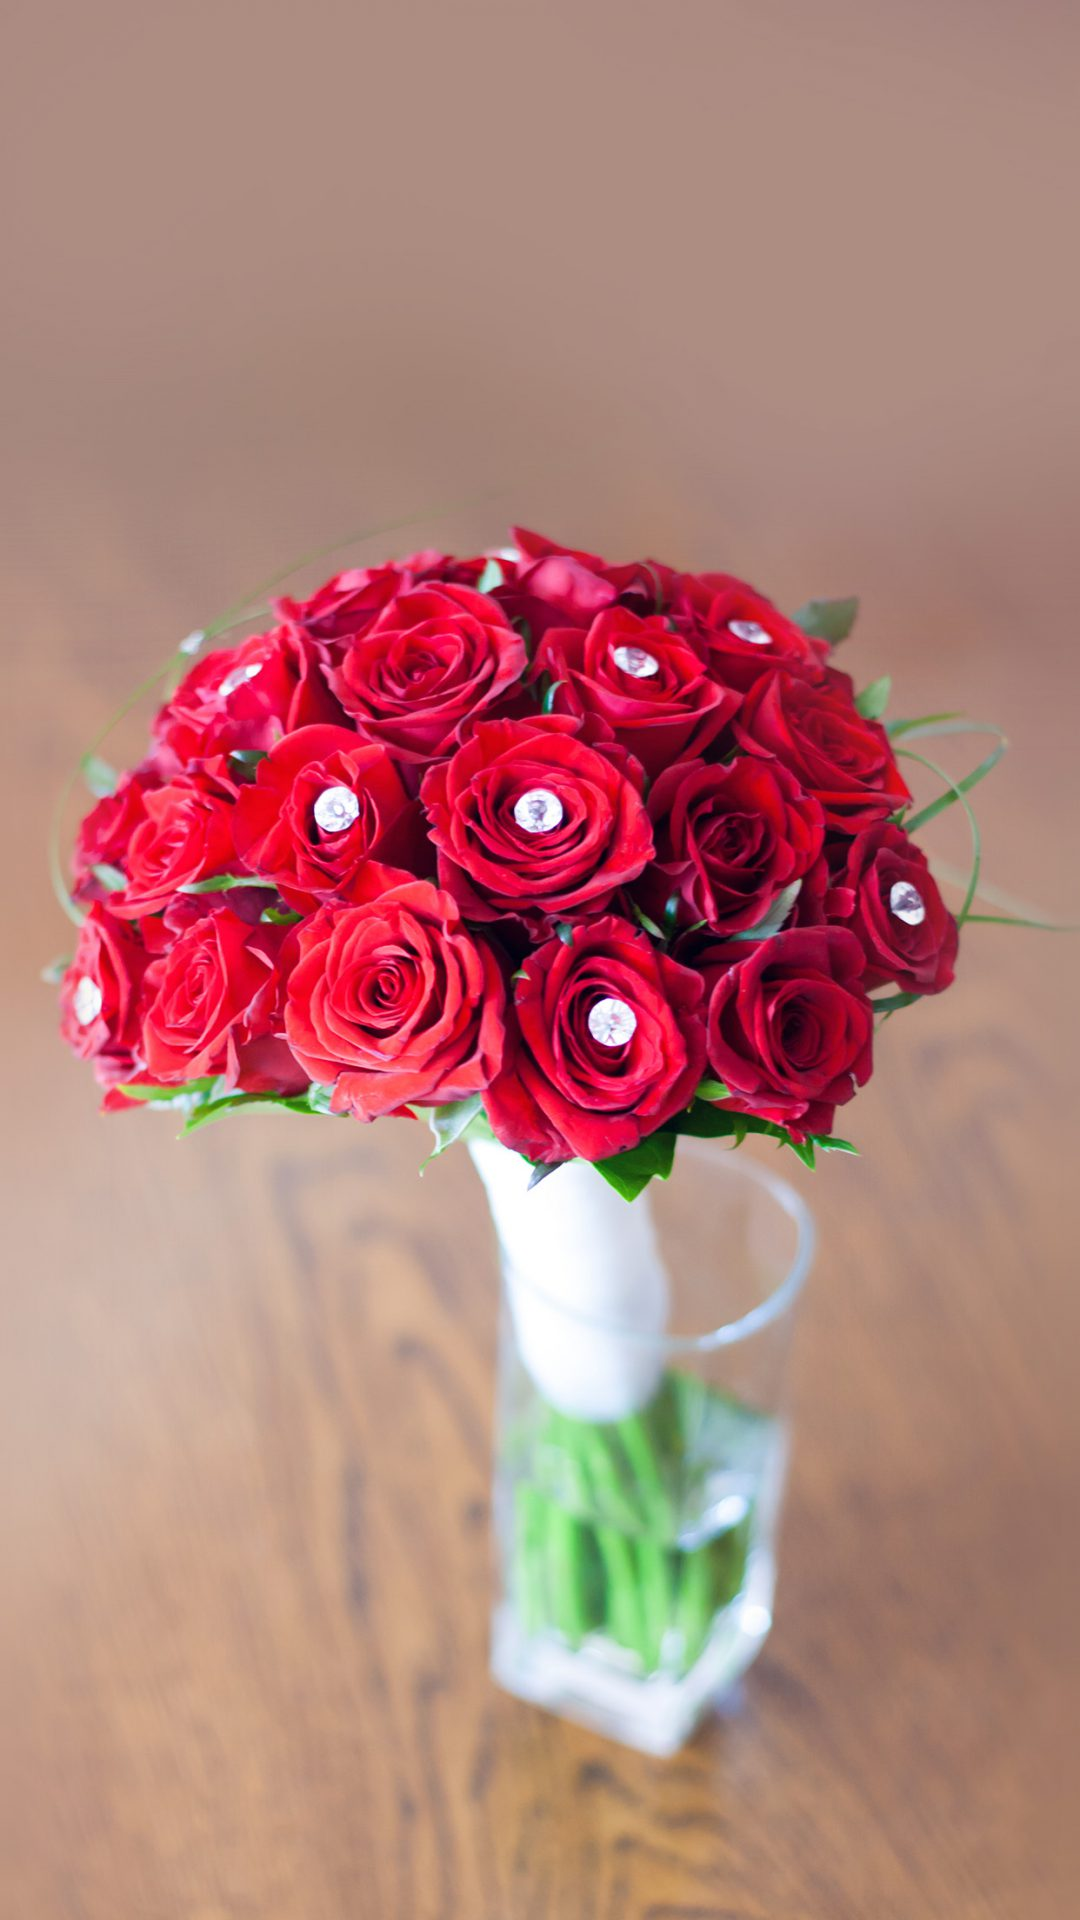 Flower Red Vase Life Art Nature Rose Sprin